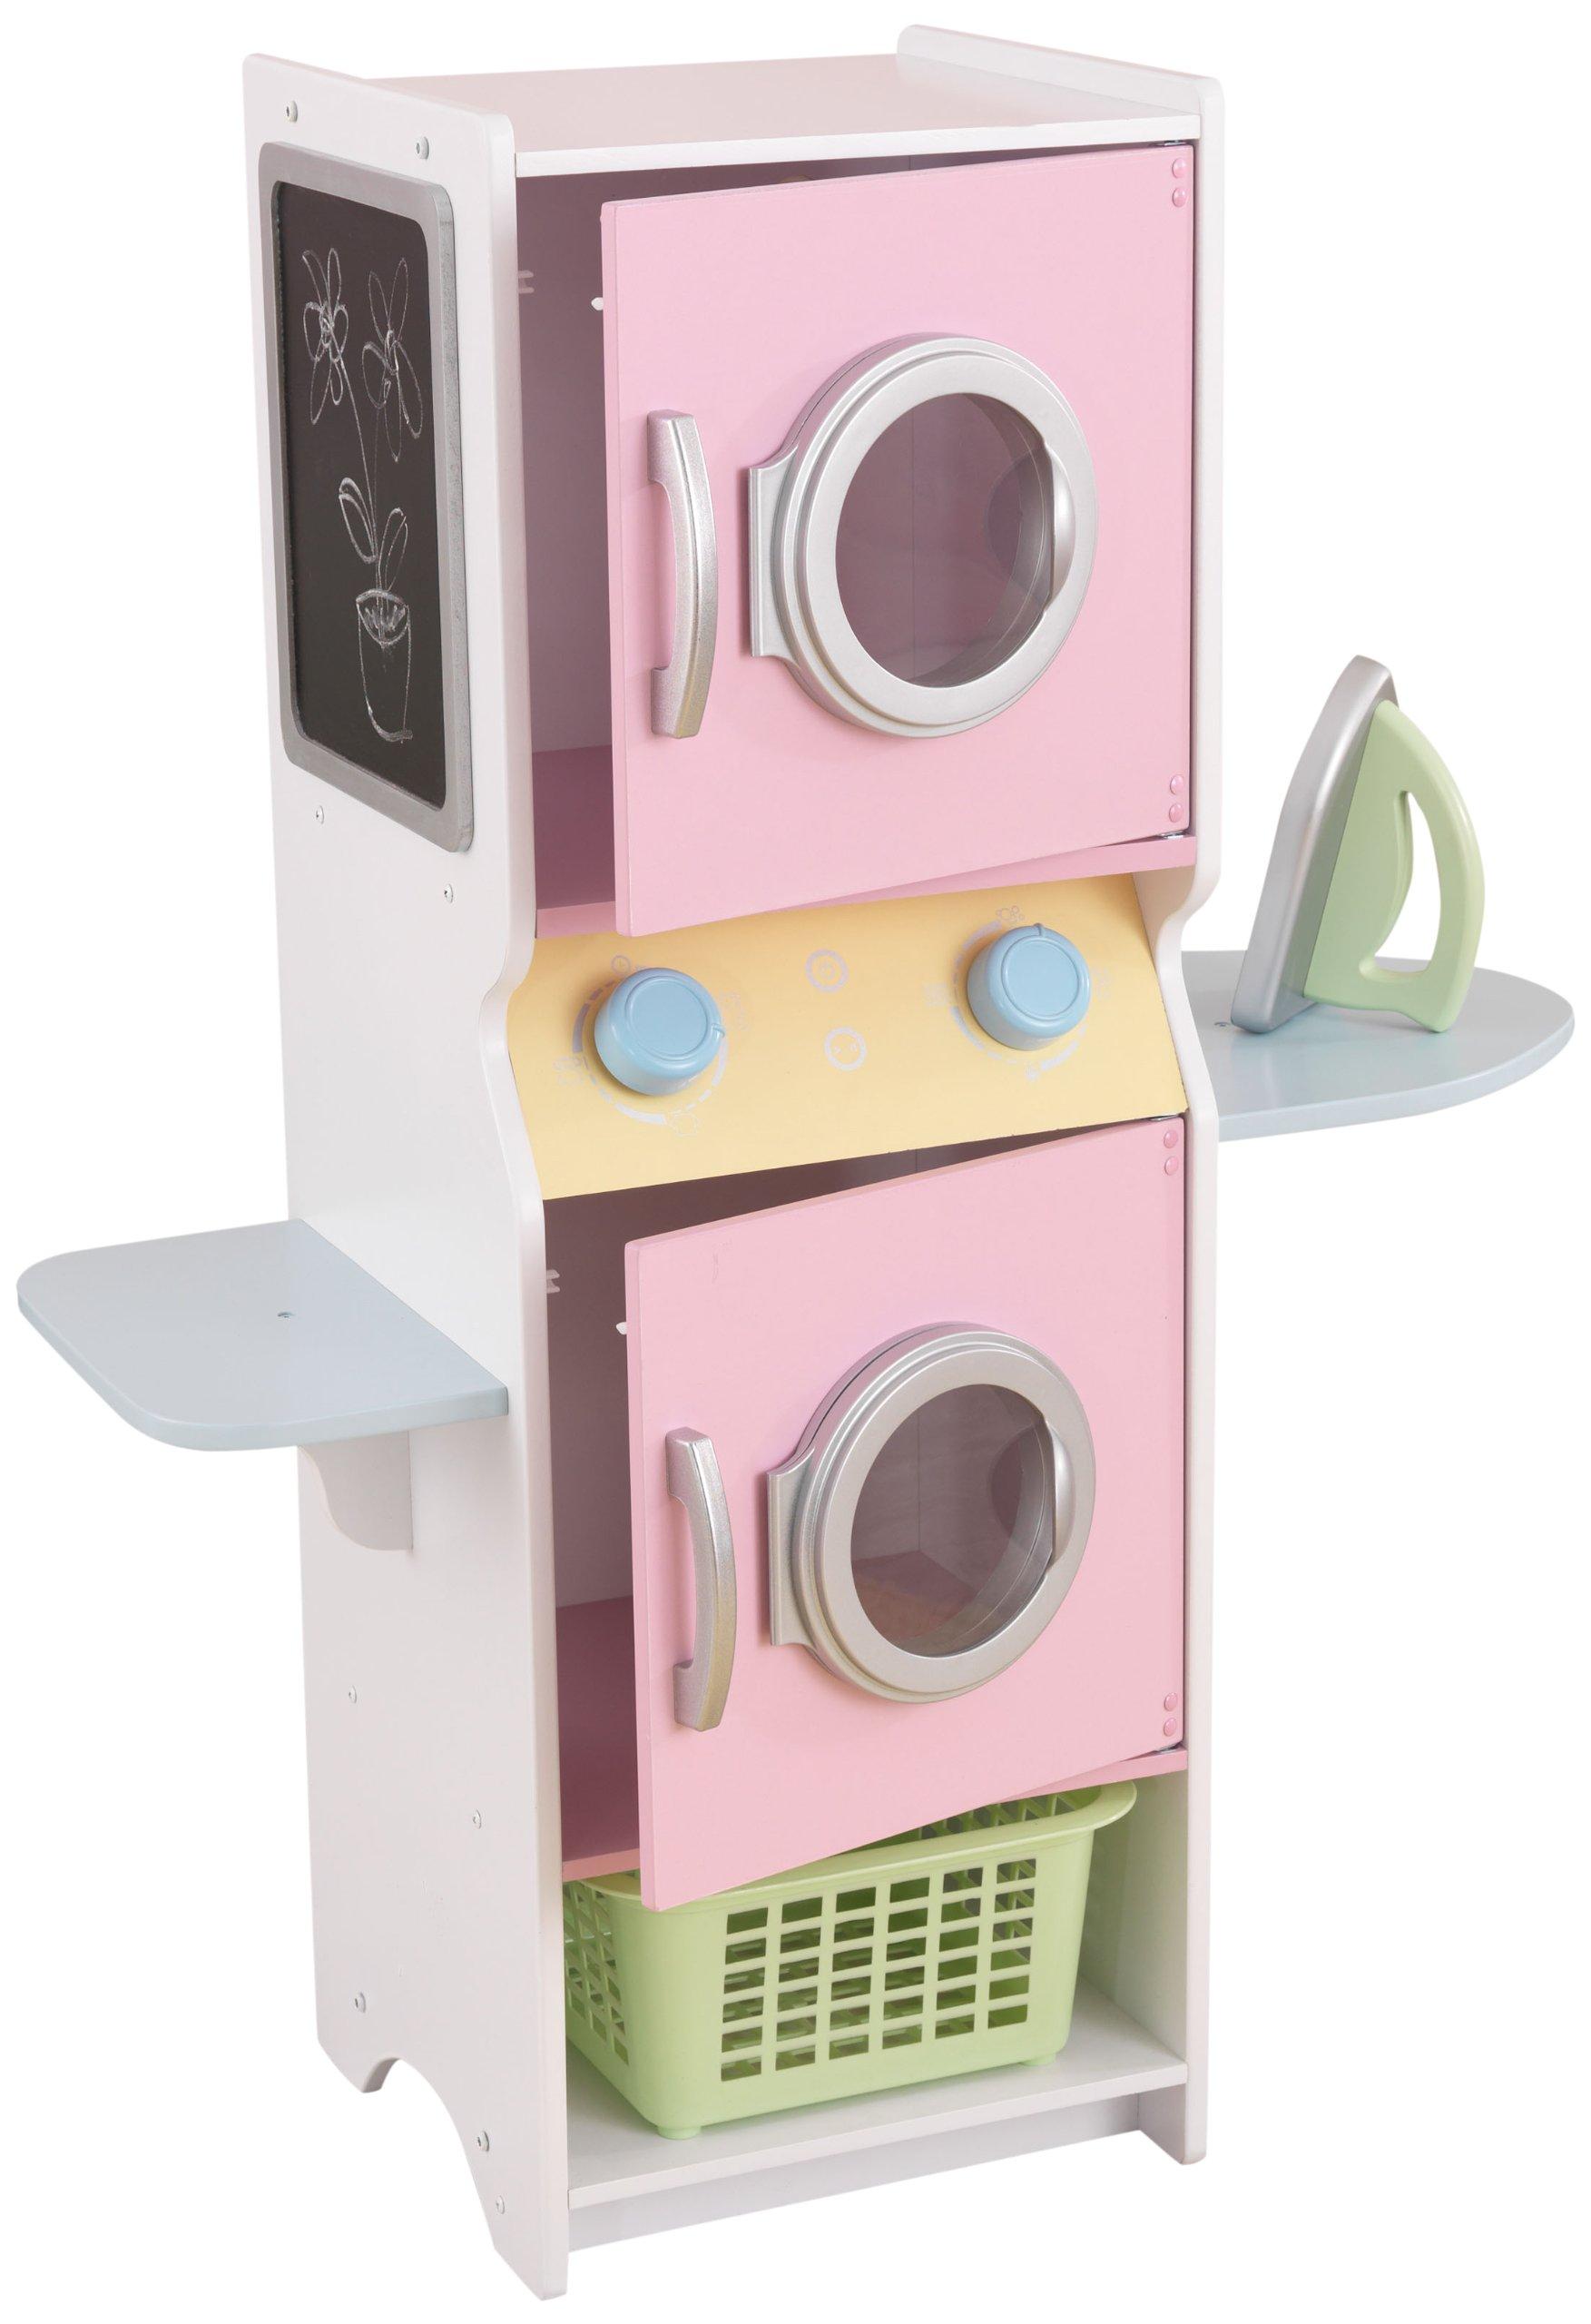 real kidkraft wood pretend washer and dryer play set for kids girls toy playset 660960287776 ebay. Black Bedroom Furniture Sets. Home Design Ideas